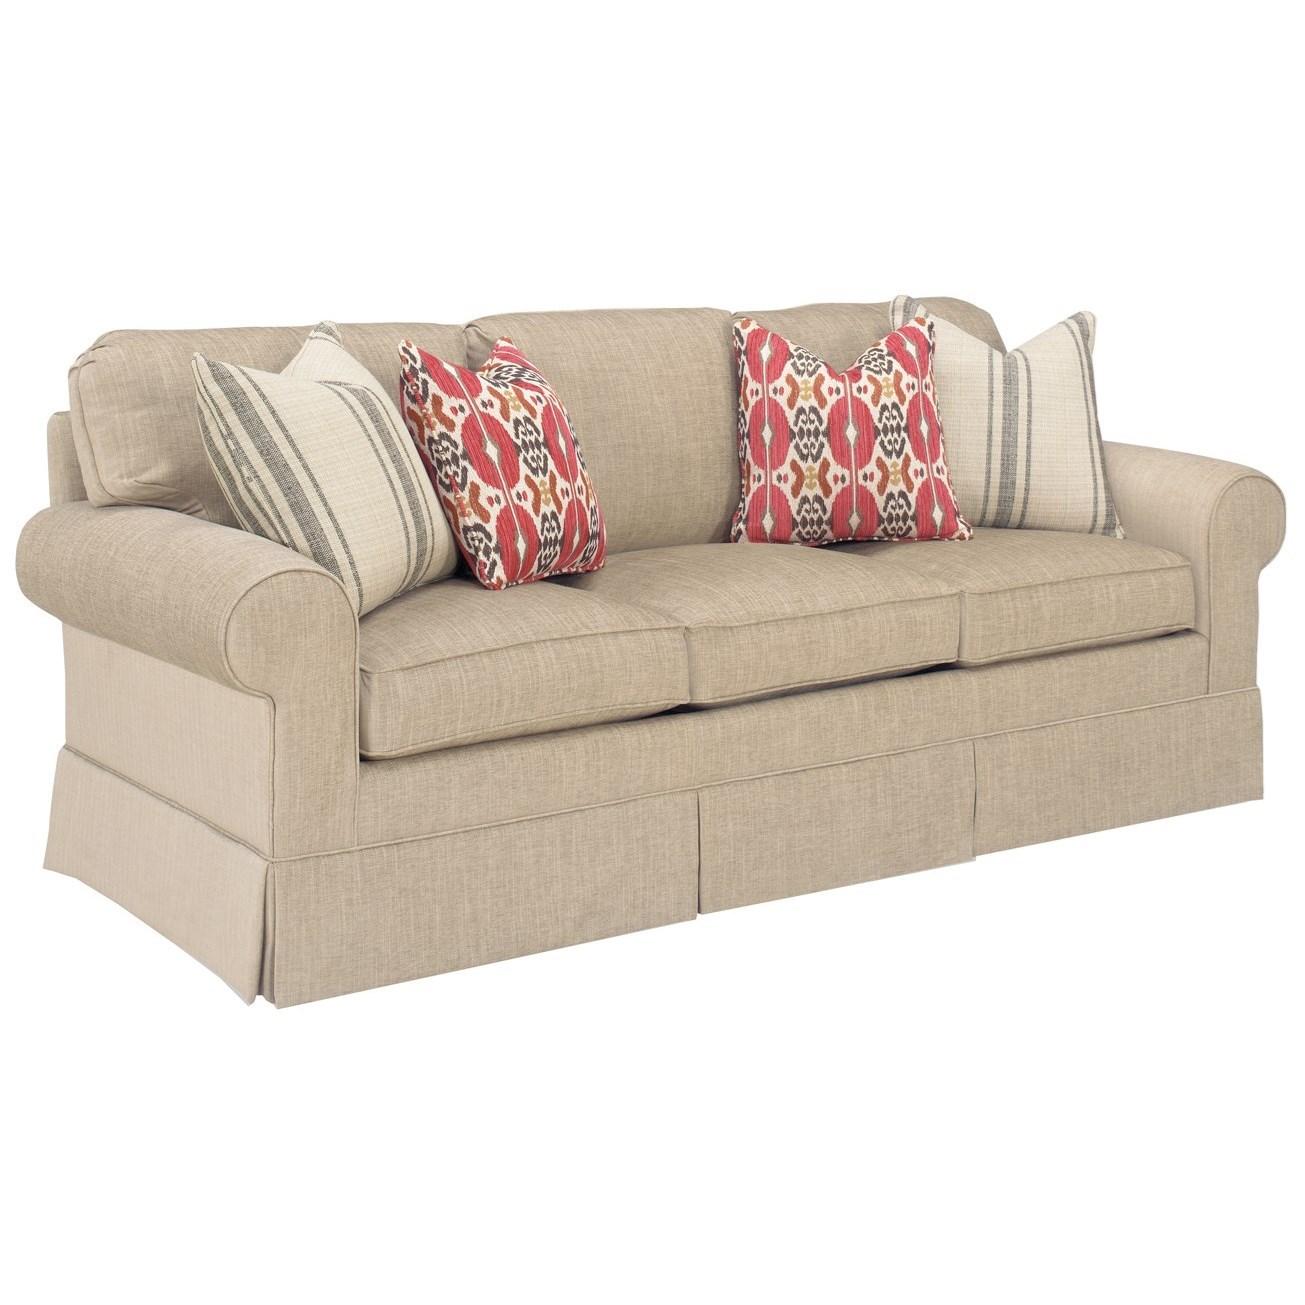 Bedford Customizable Sleeper Sofa